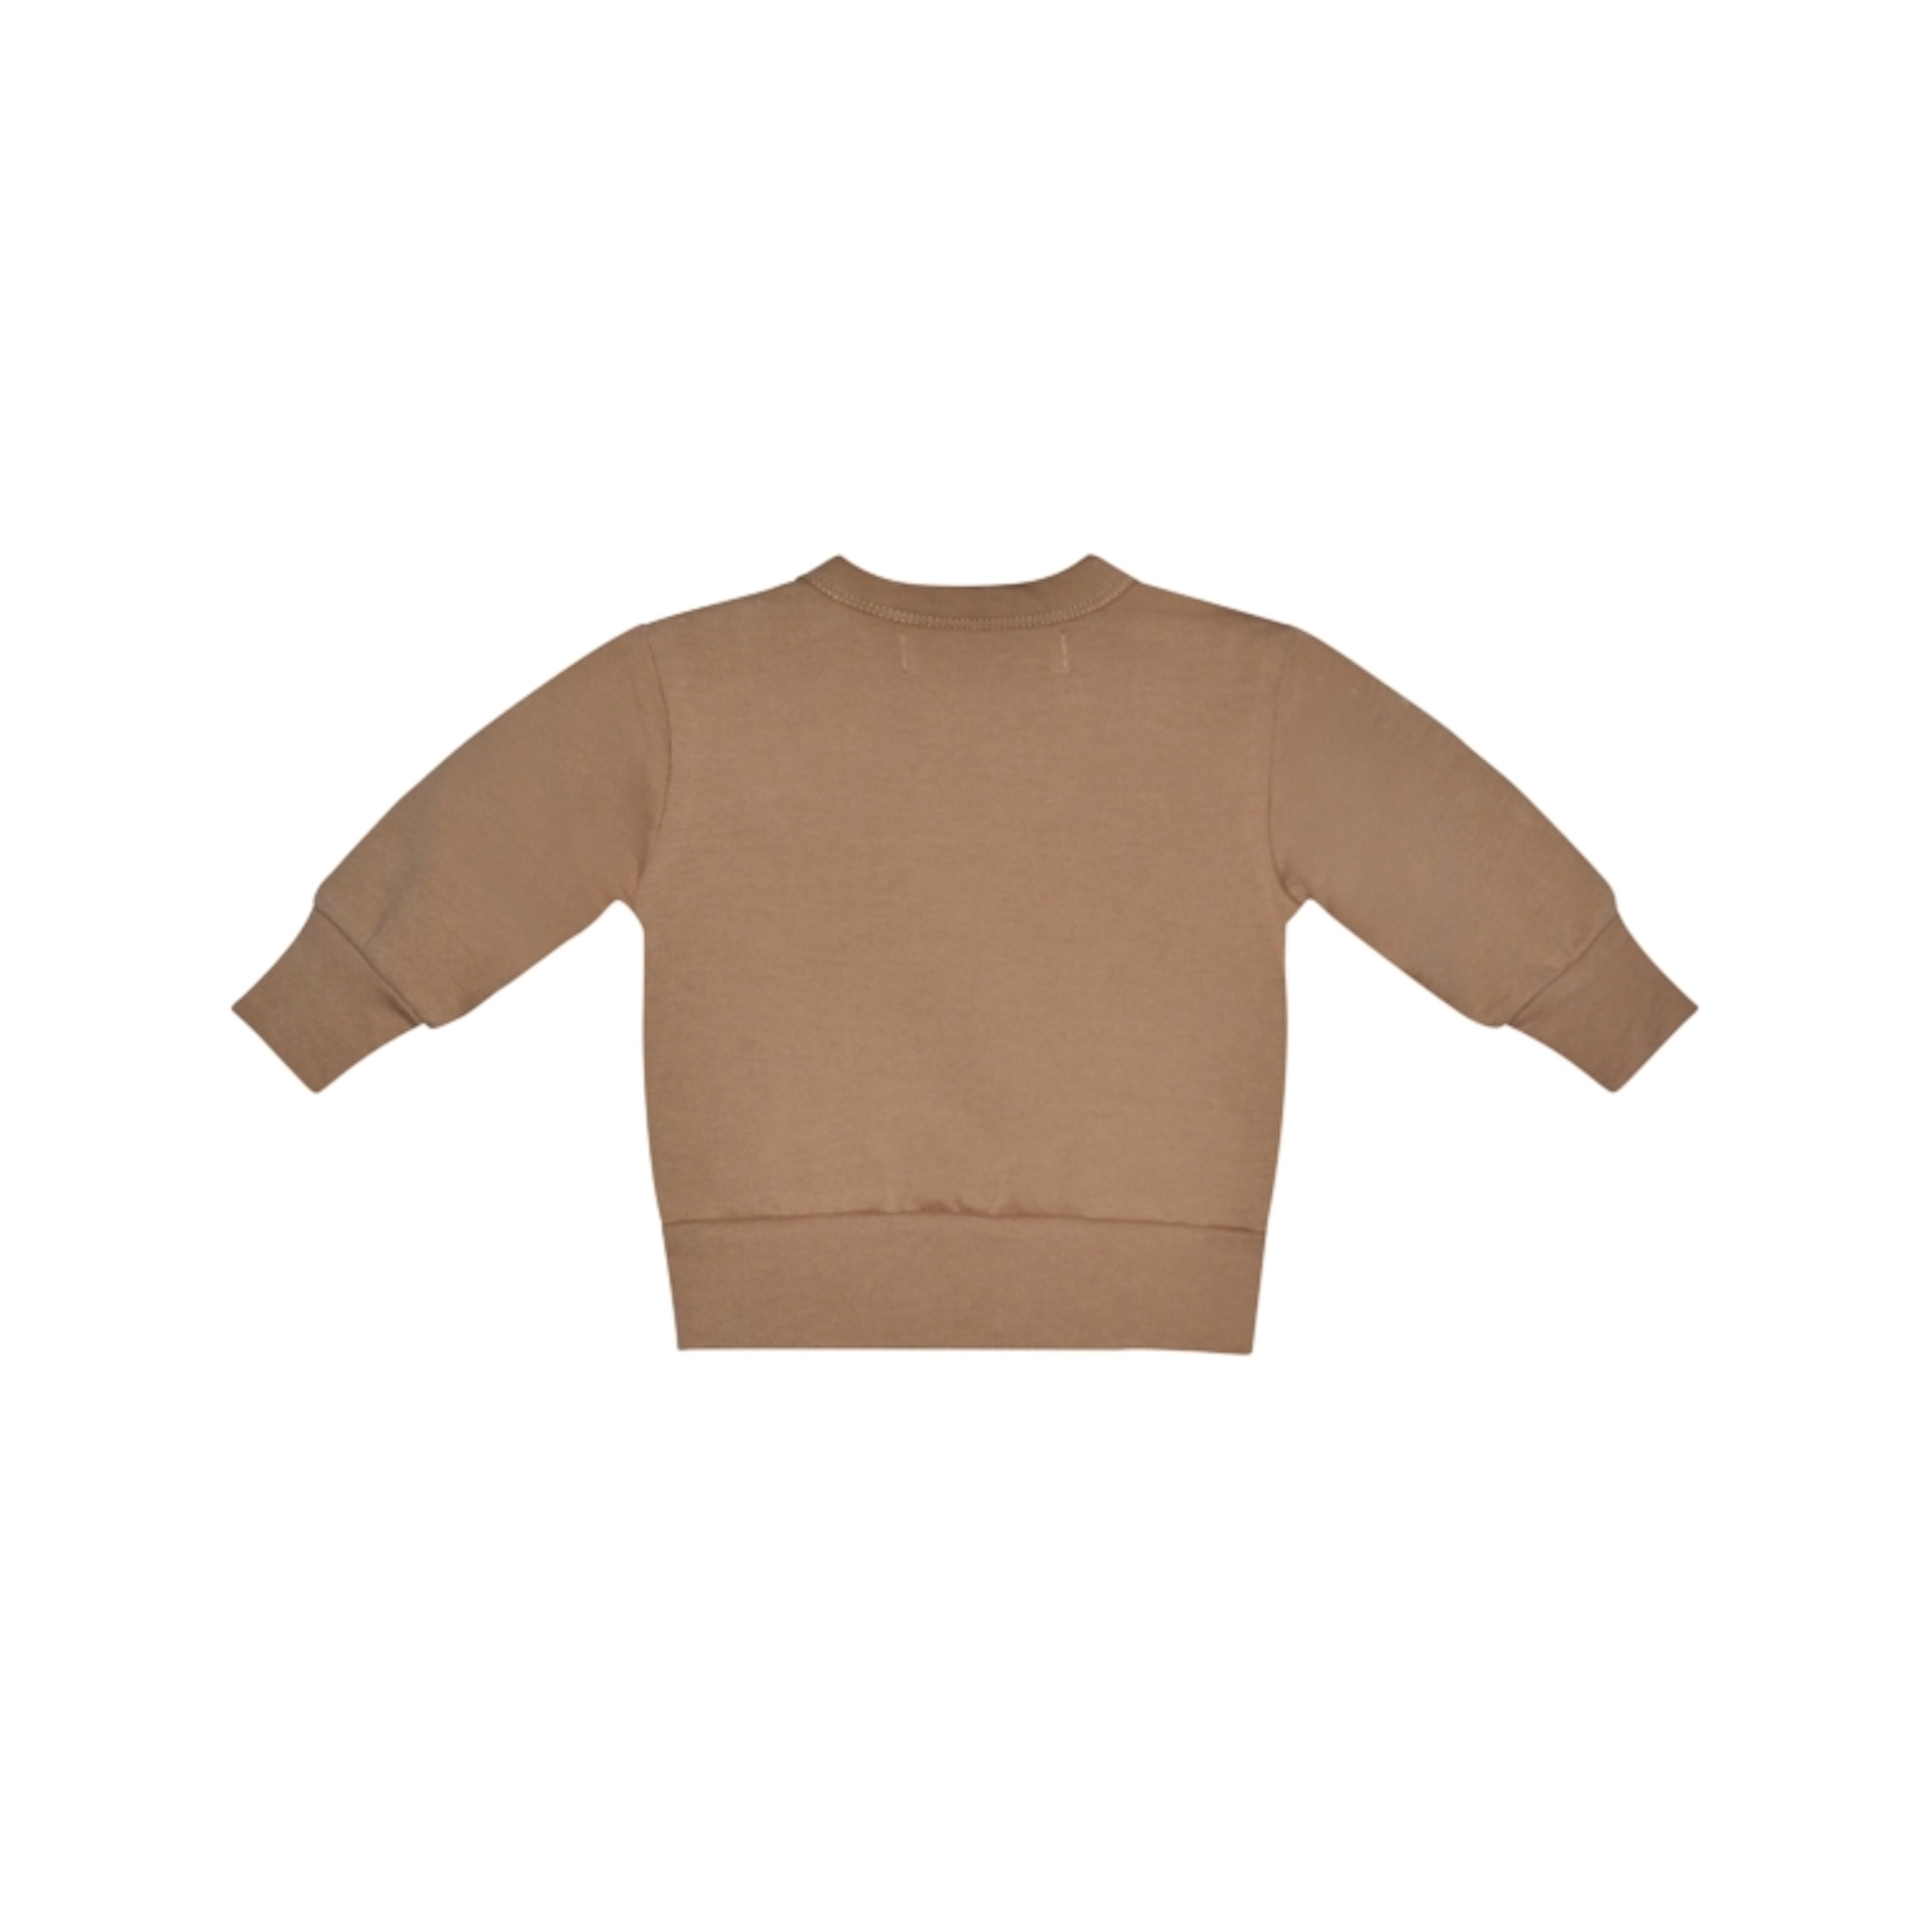 I dig denim - Ed Sweater Organic - brown